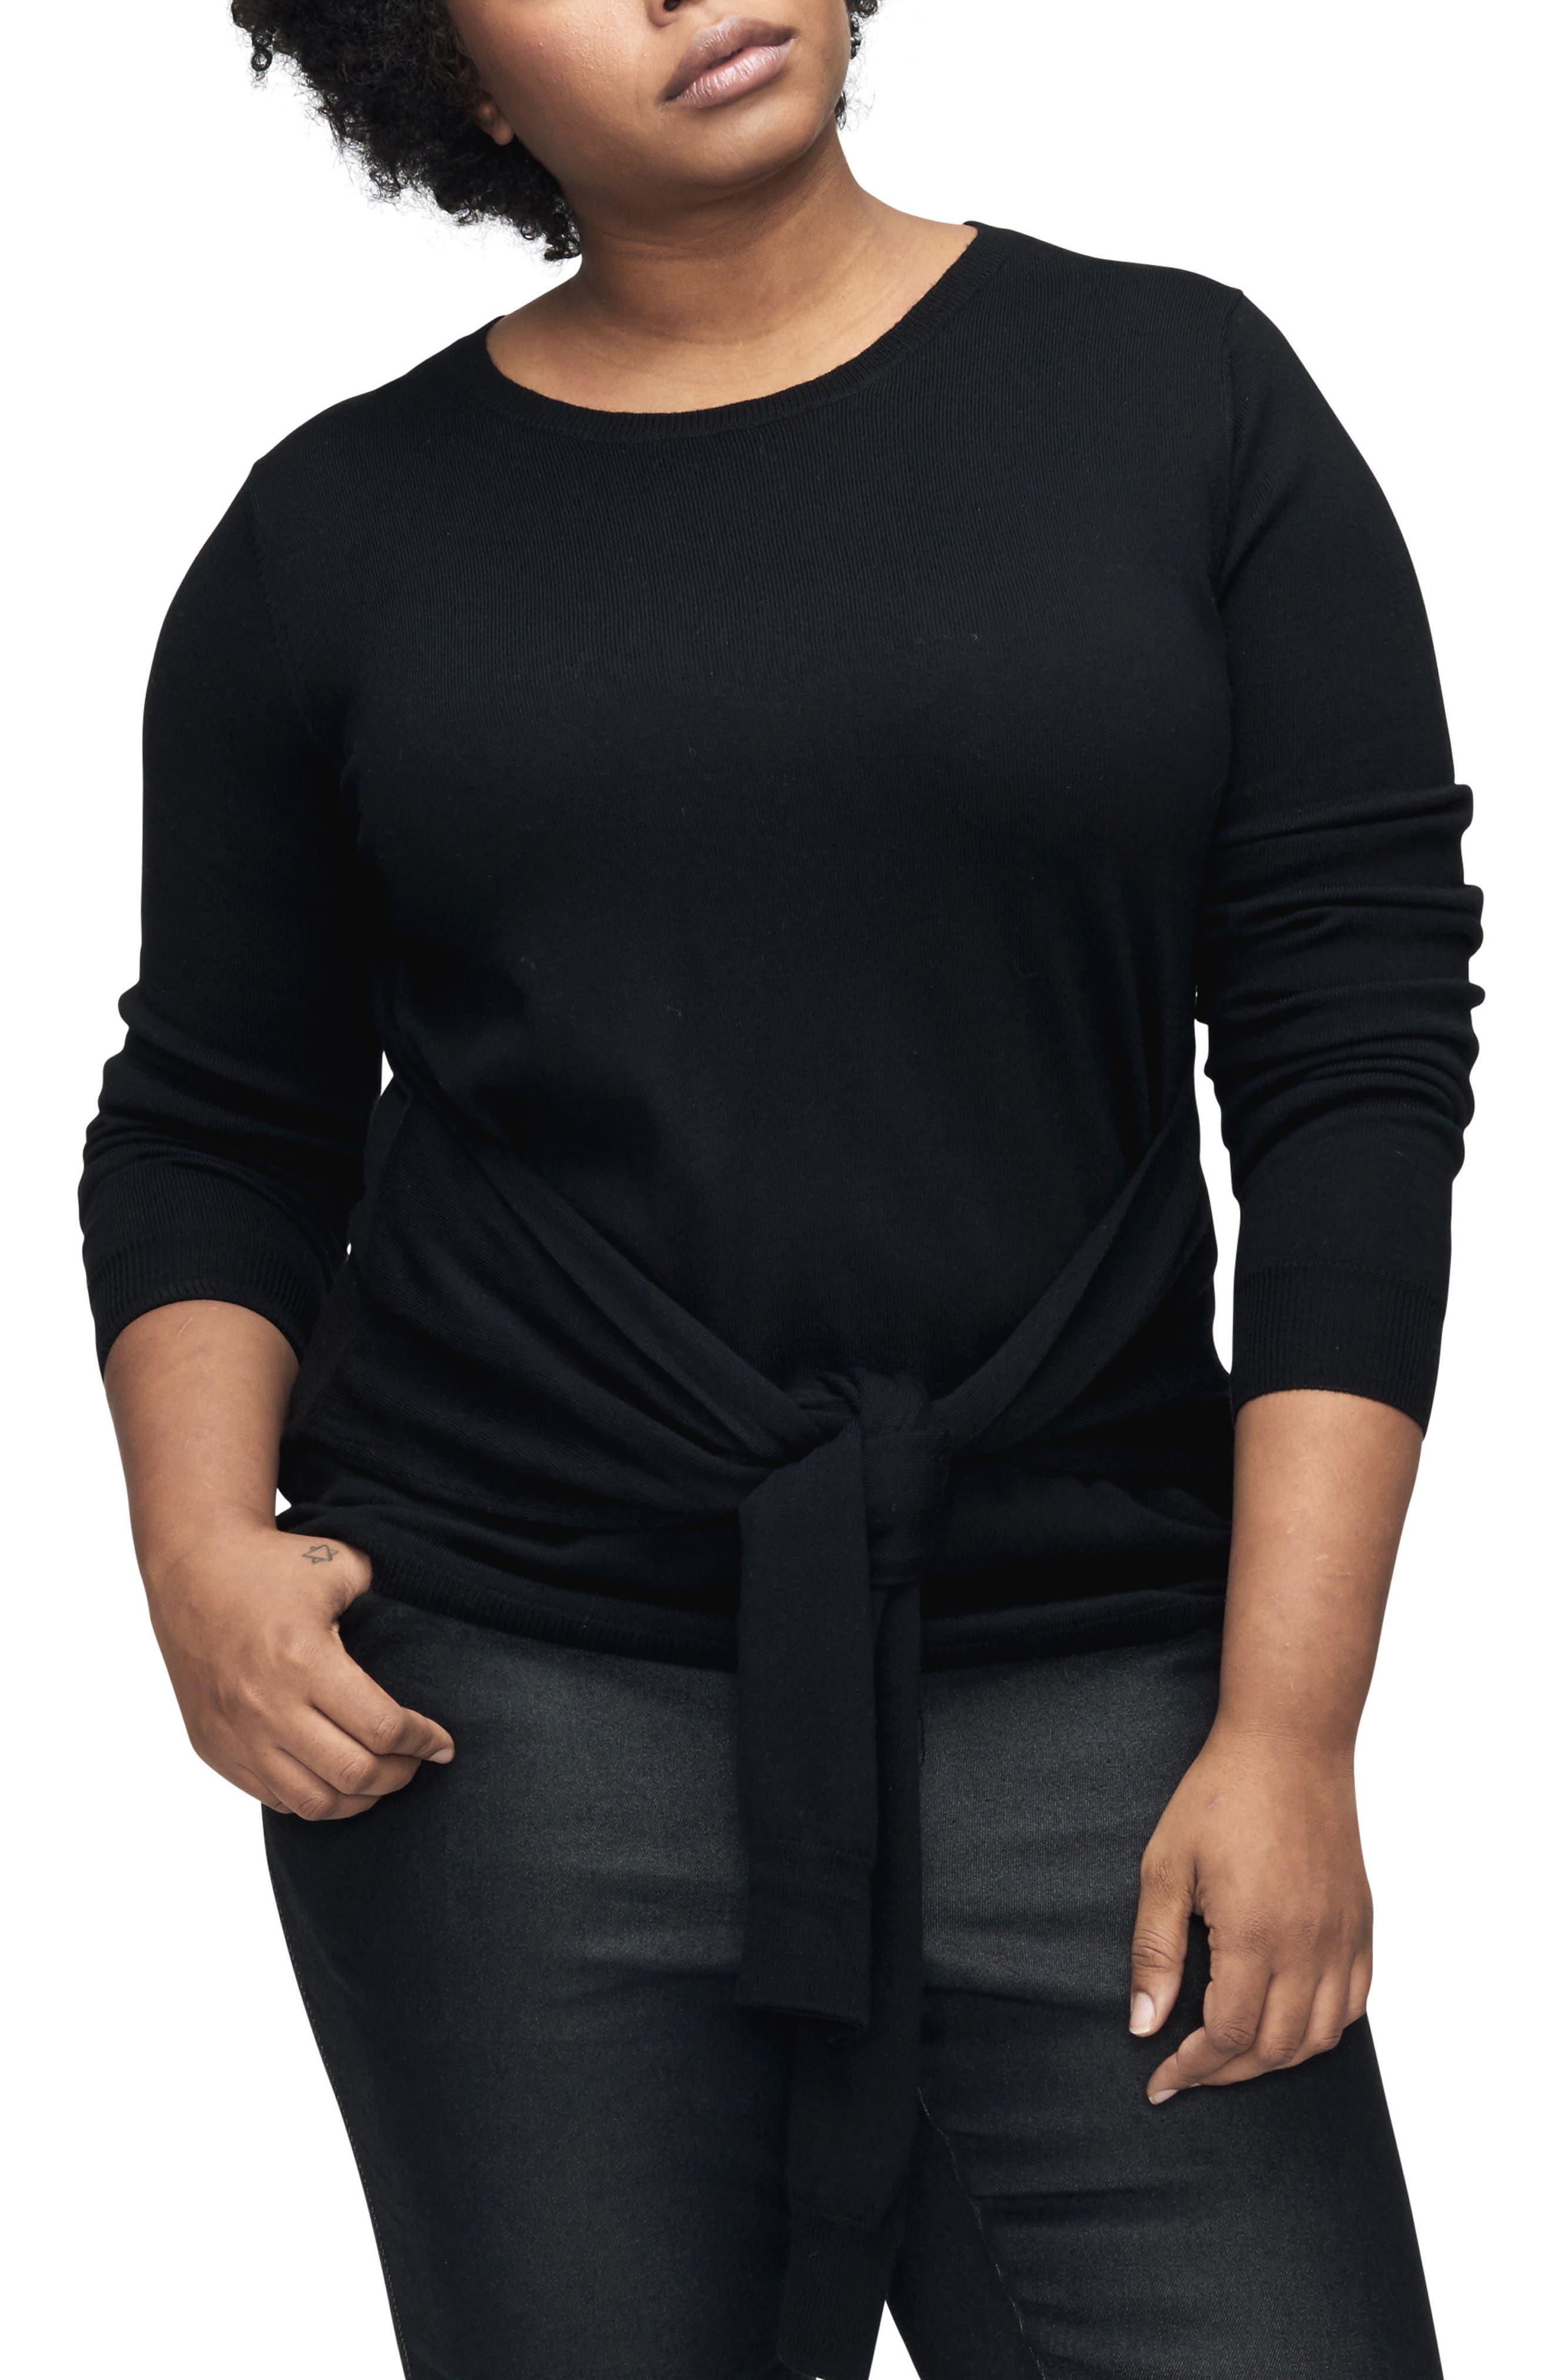 UNIVERSAL STANDARD Mae Tie Front Sweater